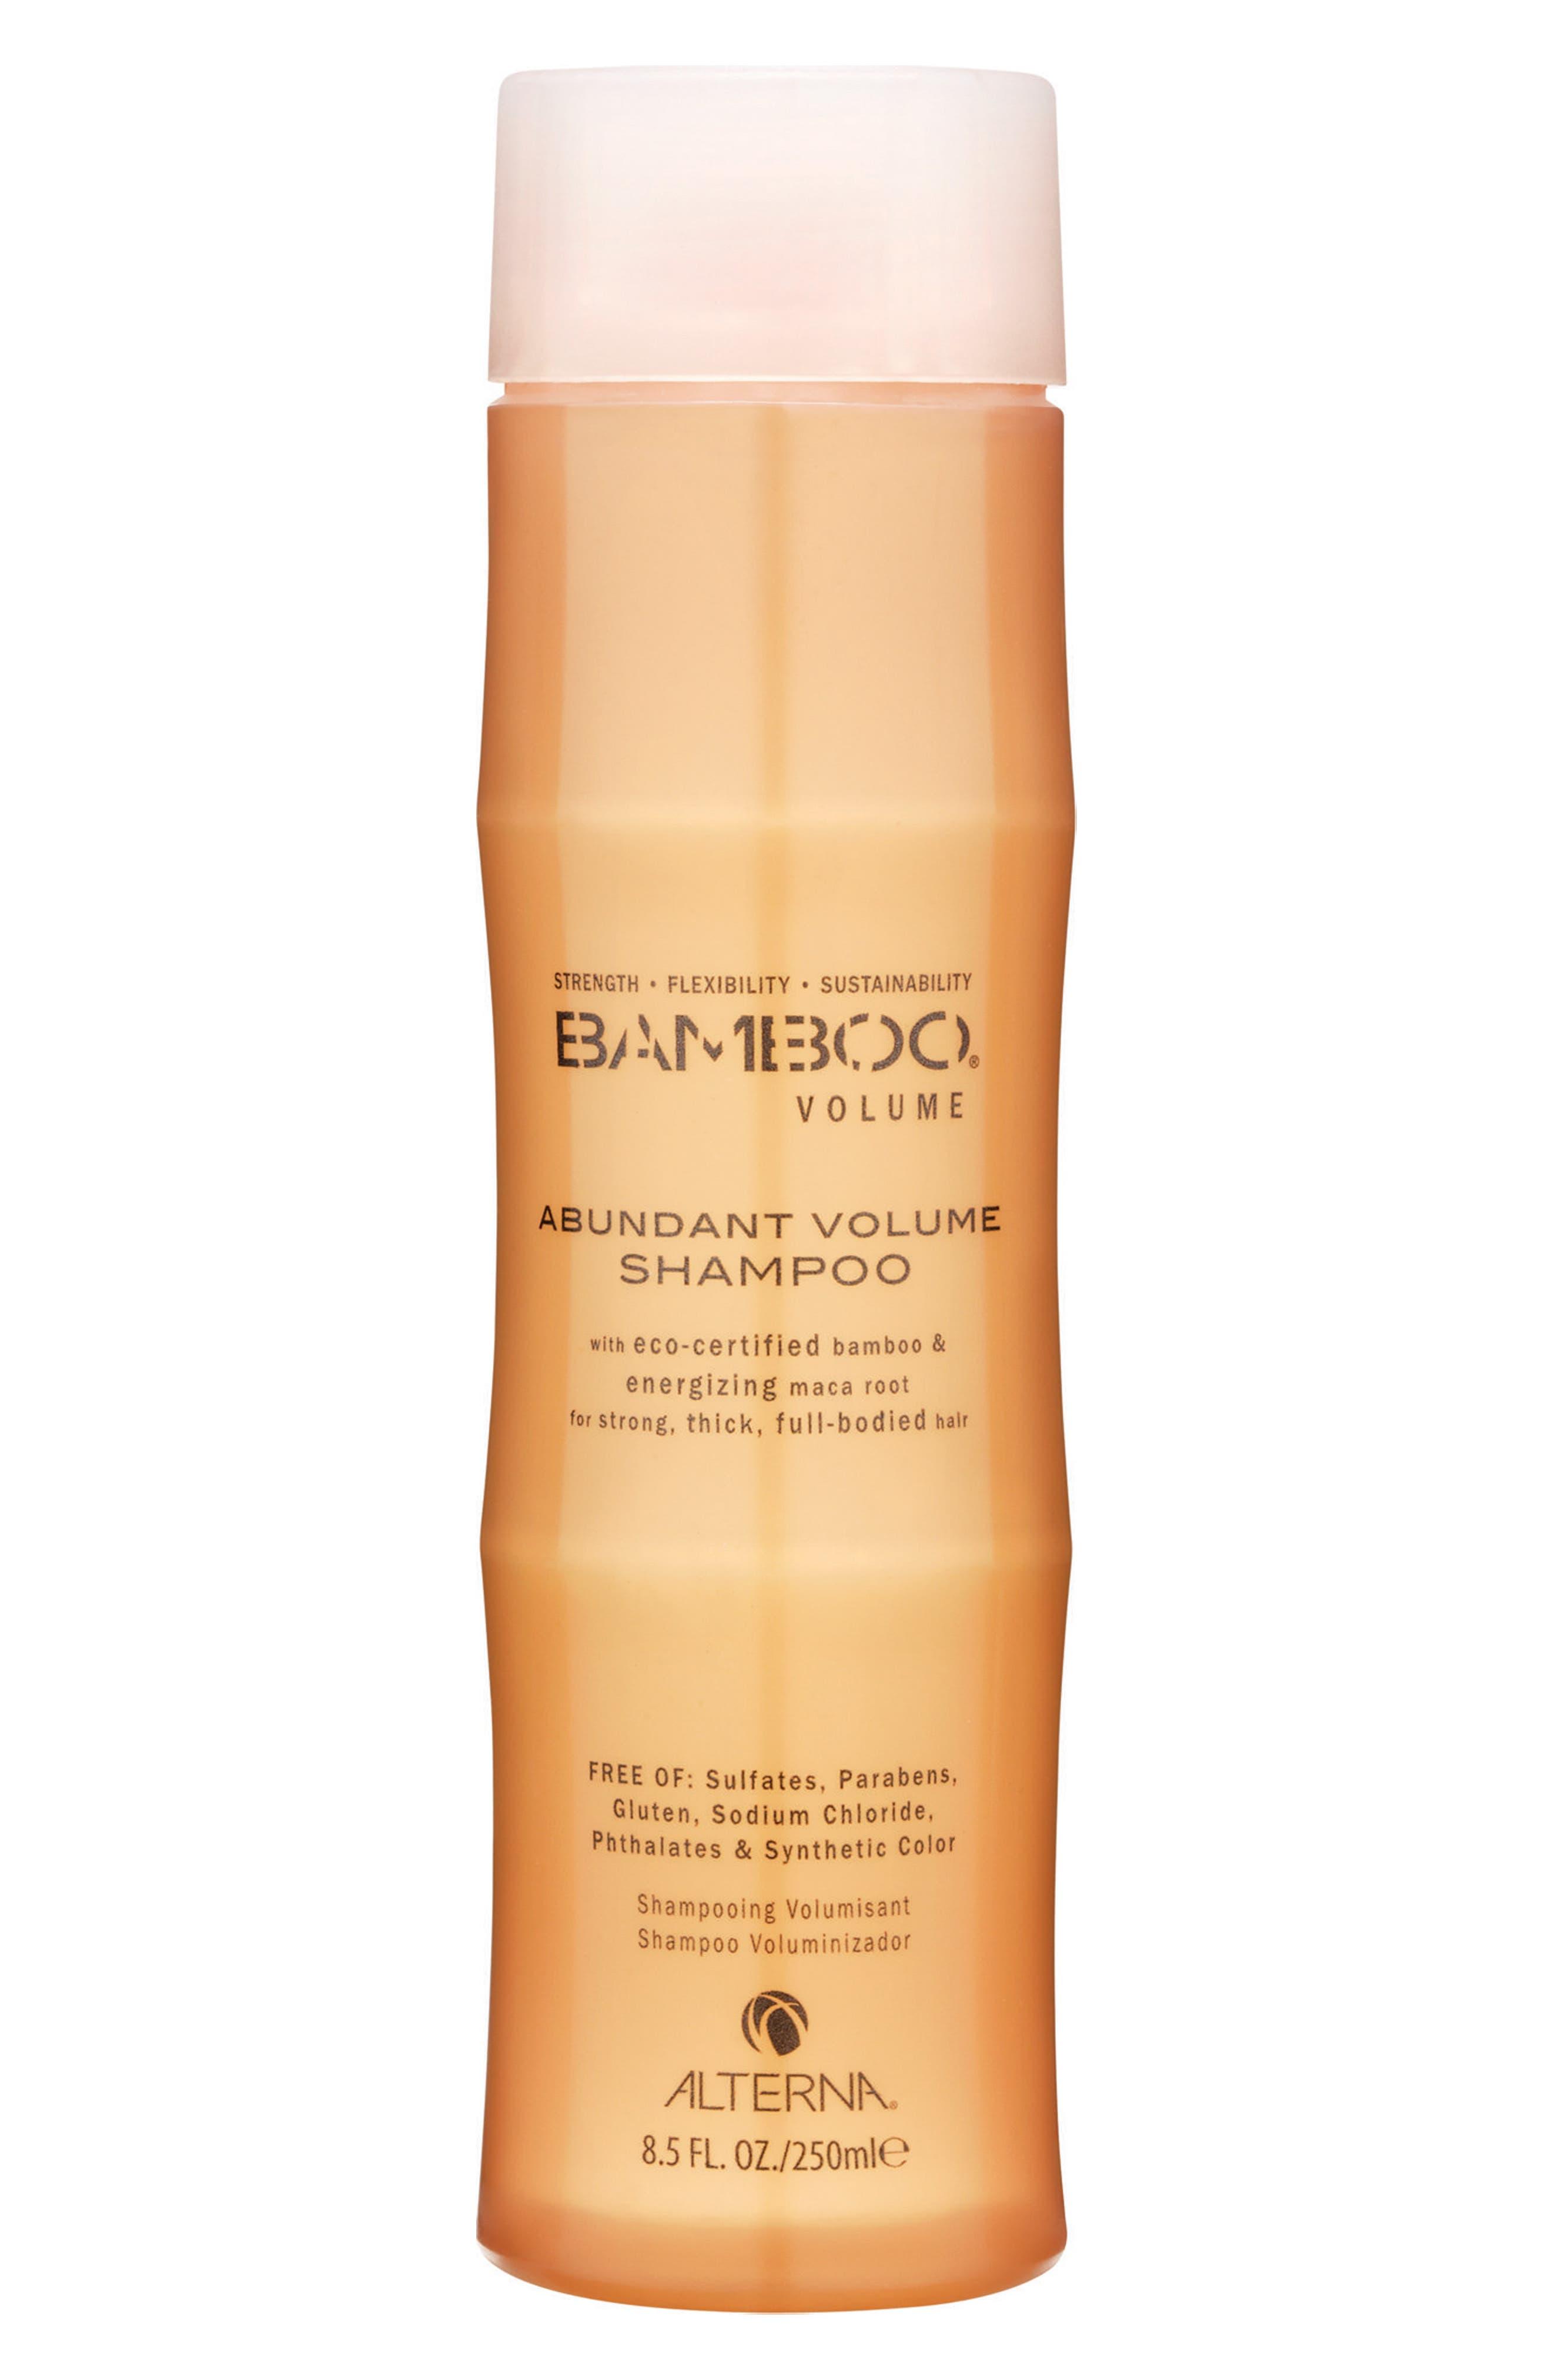 ALTERNA® Bamboo Volume Abundant Volume Shampoo